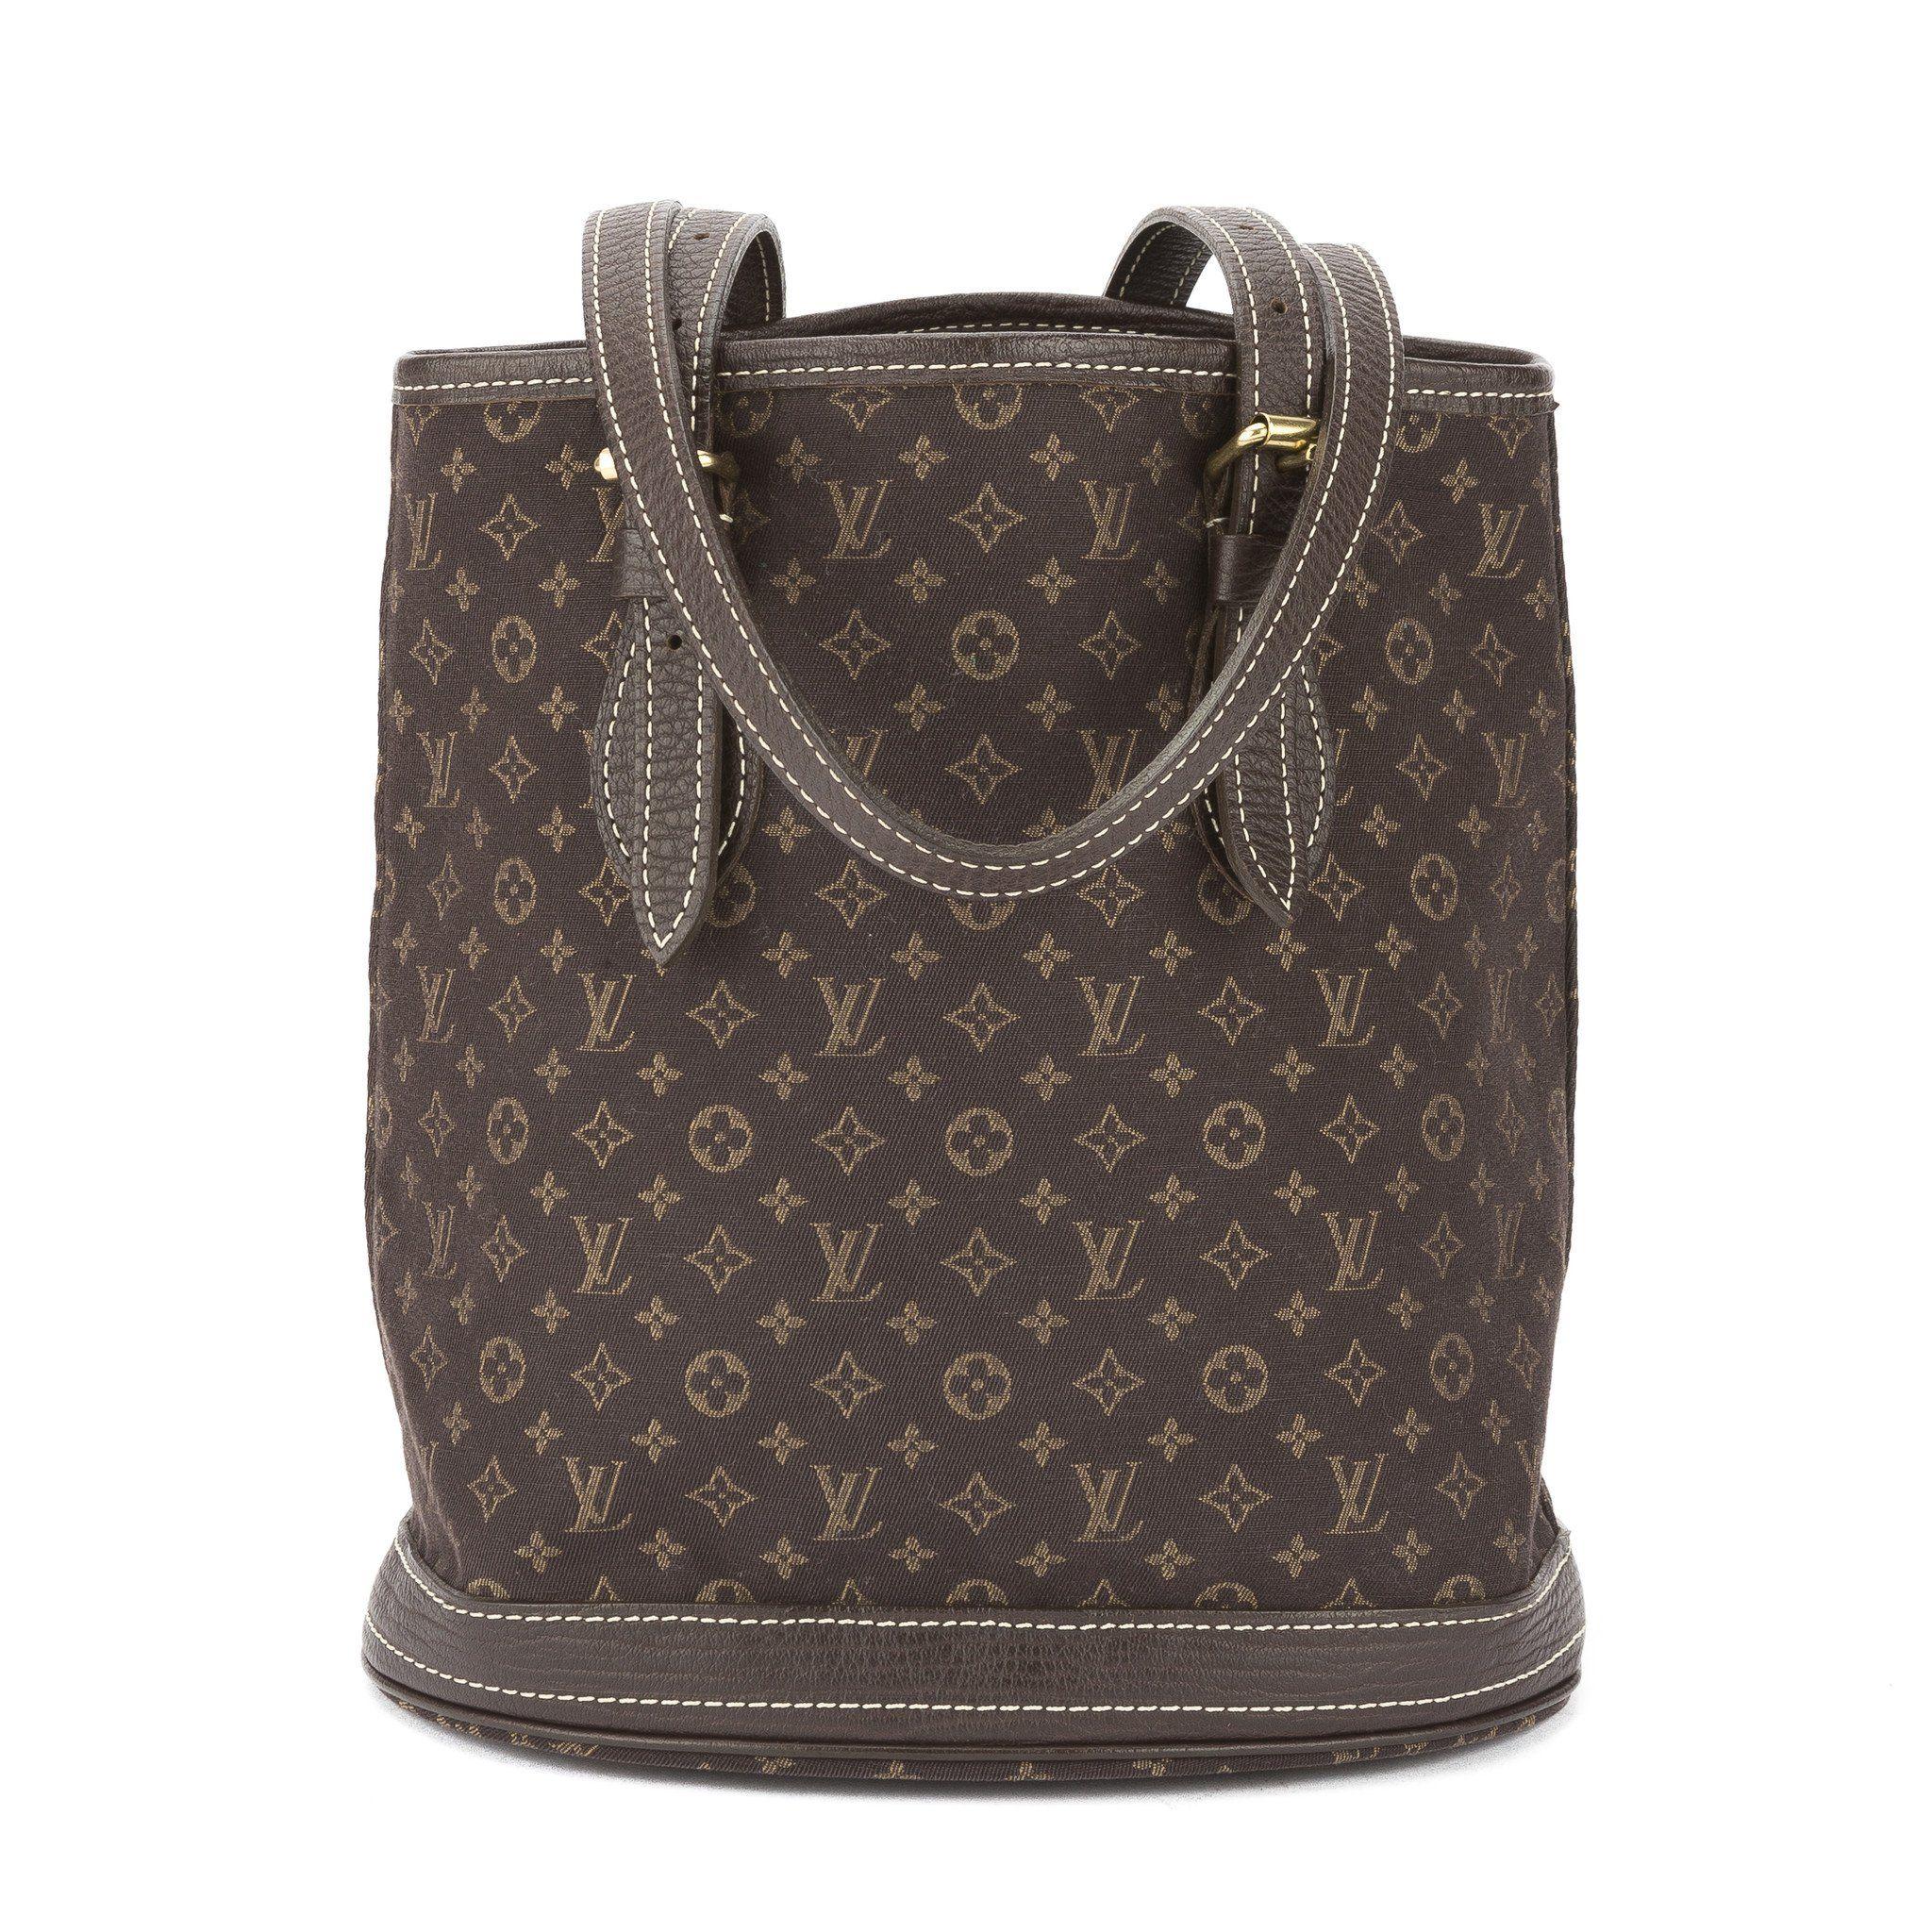 6332c94c5ab2 Louis Vuitton Ebene Monogram Mini Lin Petit Bucket Bag (Pre Owned ...